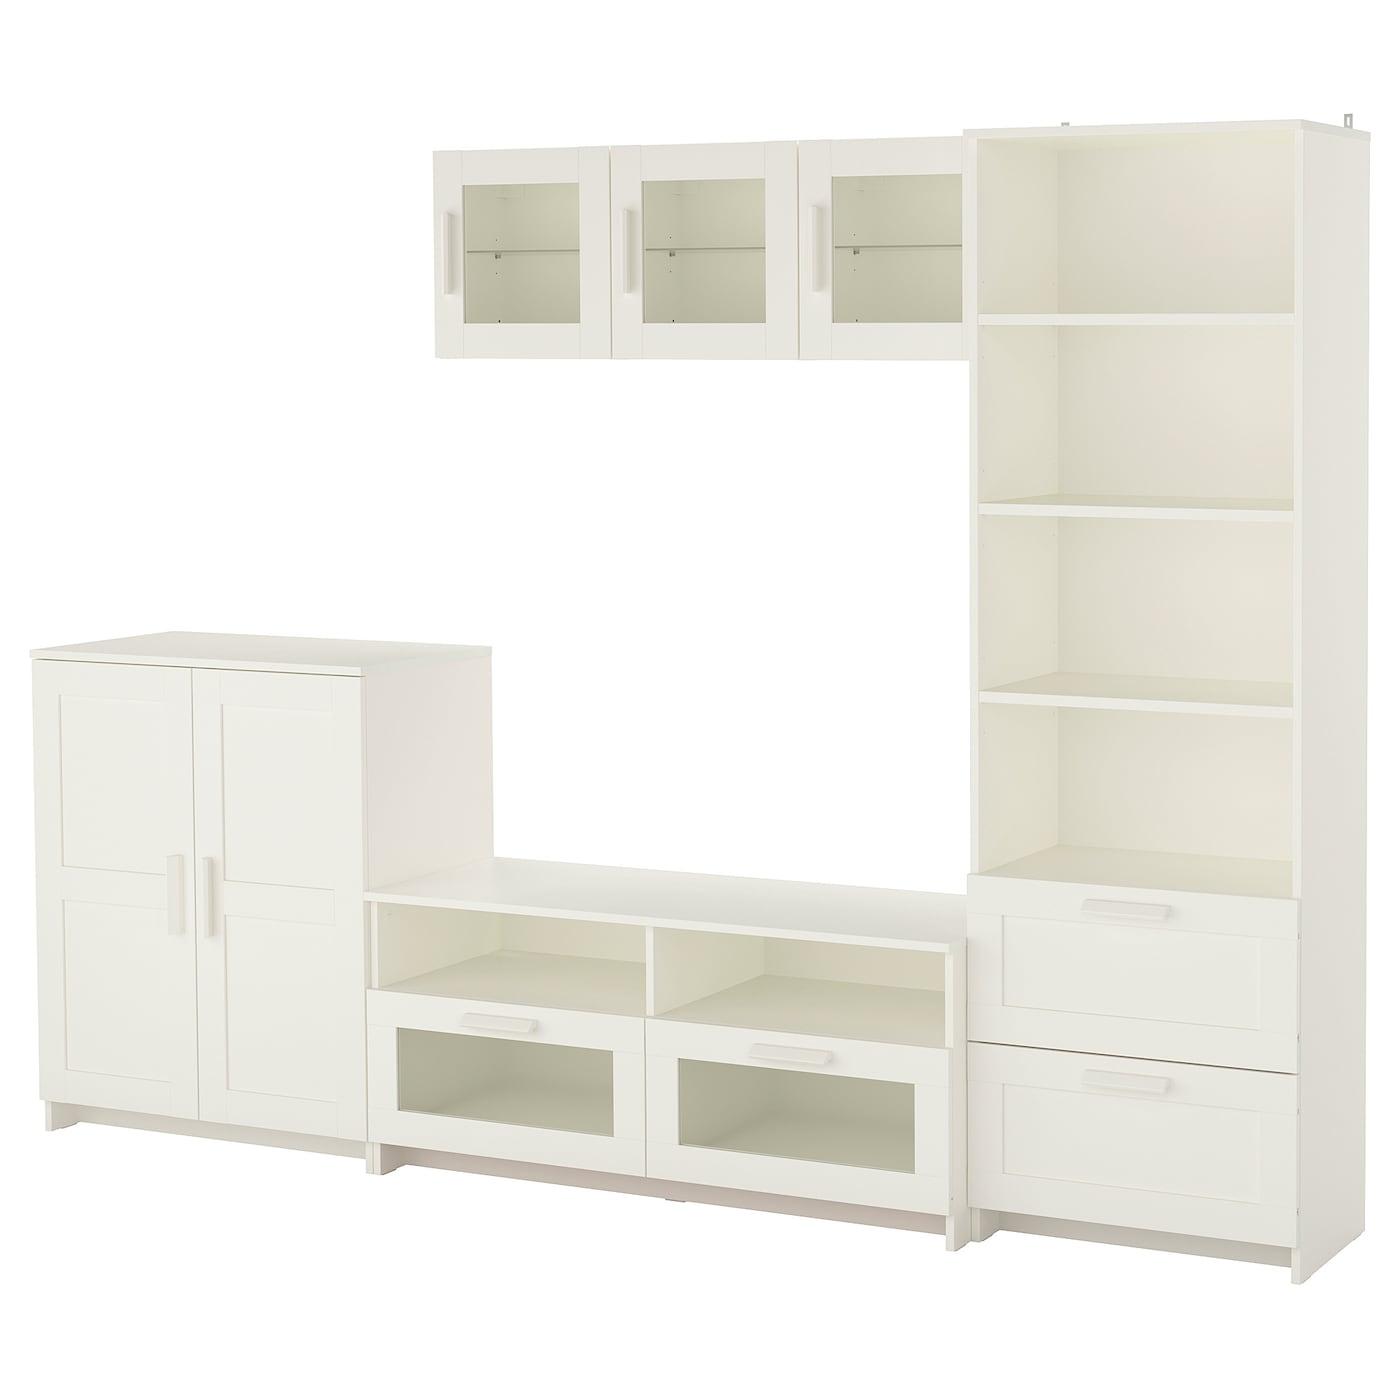 Brimnes Combinaison Meuble Tv Blanc 260x41x190 Cm Ikea # Meuble Tv Porte Vitree